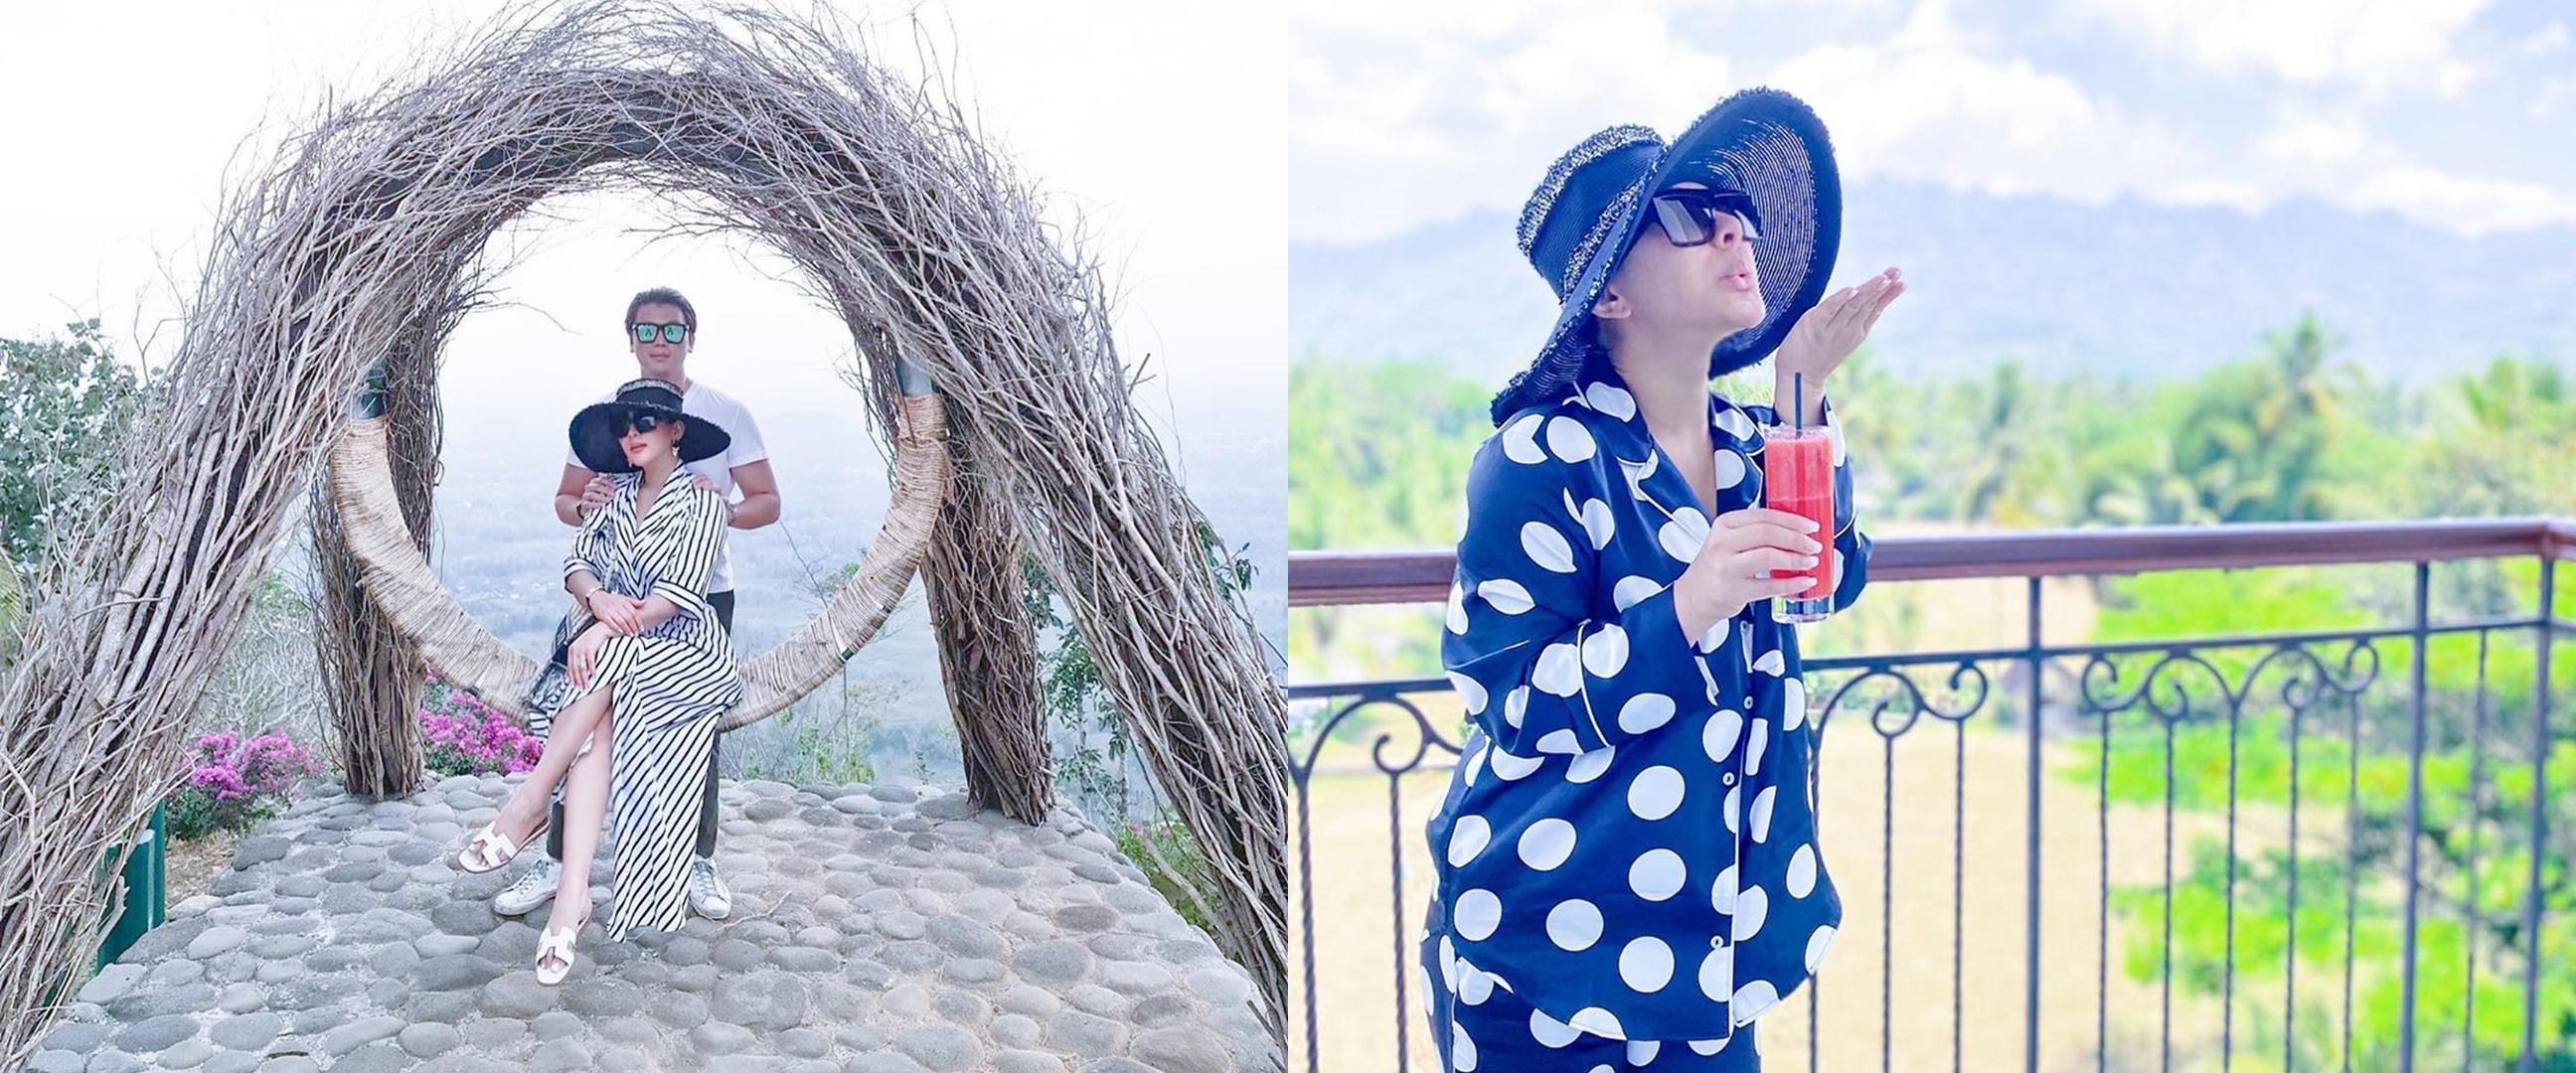 8 Gaya fashion Syahrini saat liburan, simpel tapi cetar